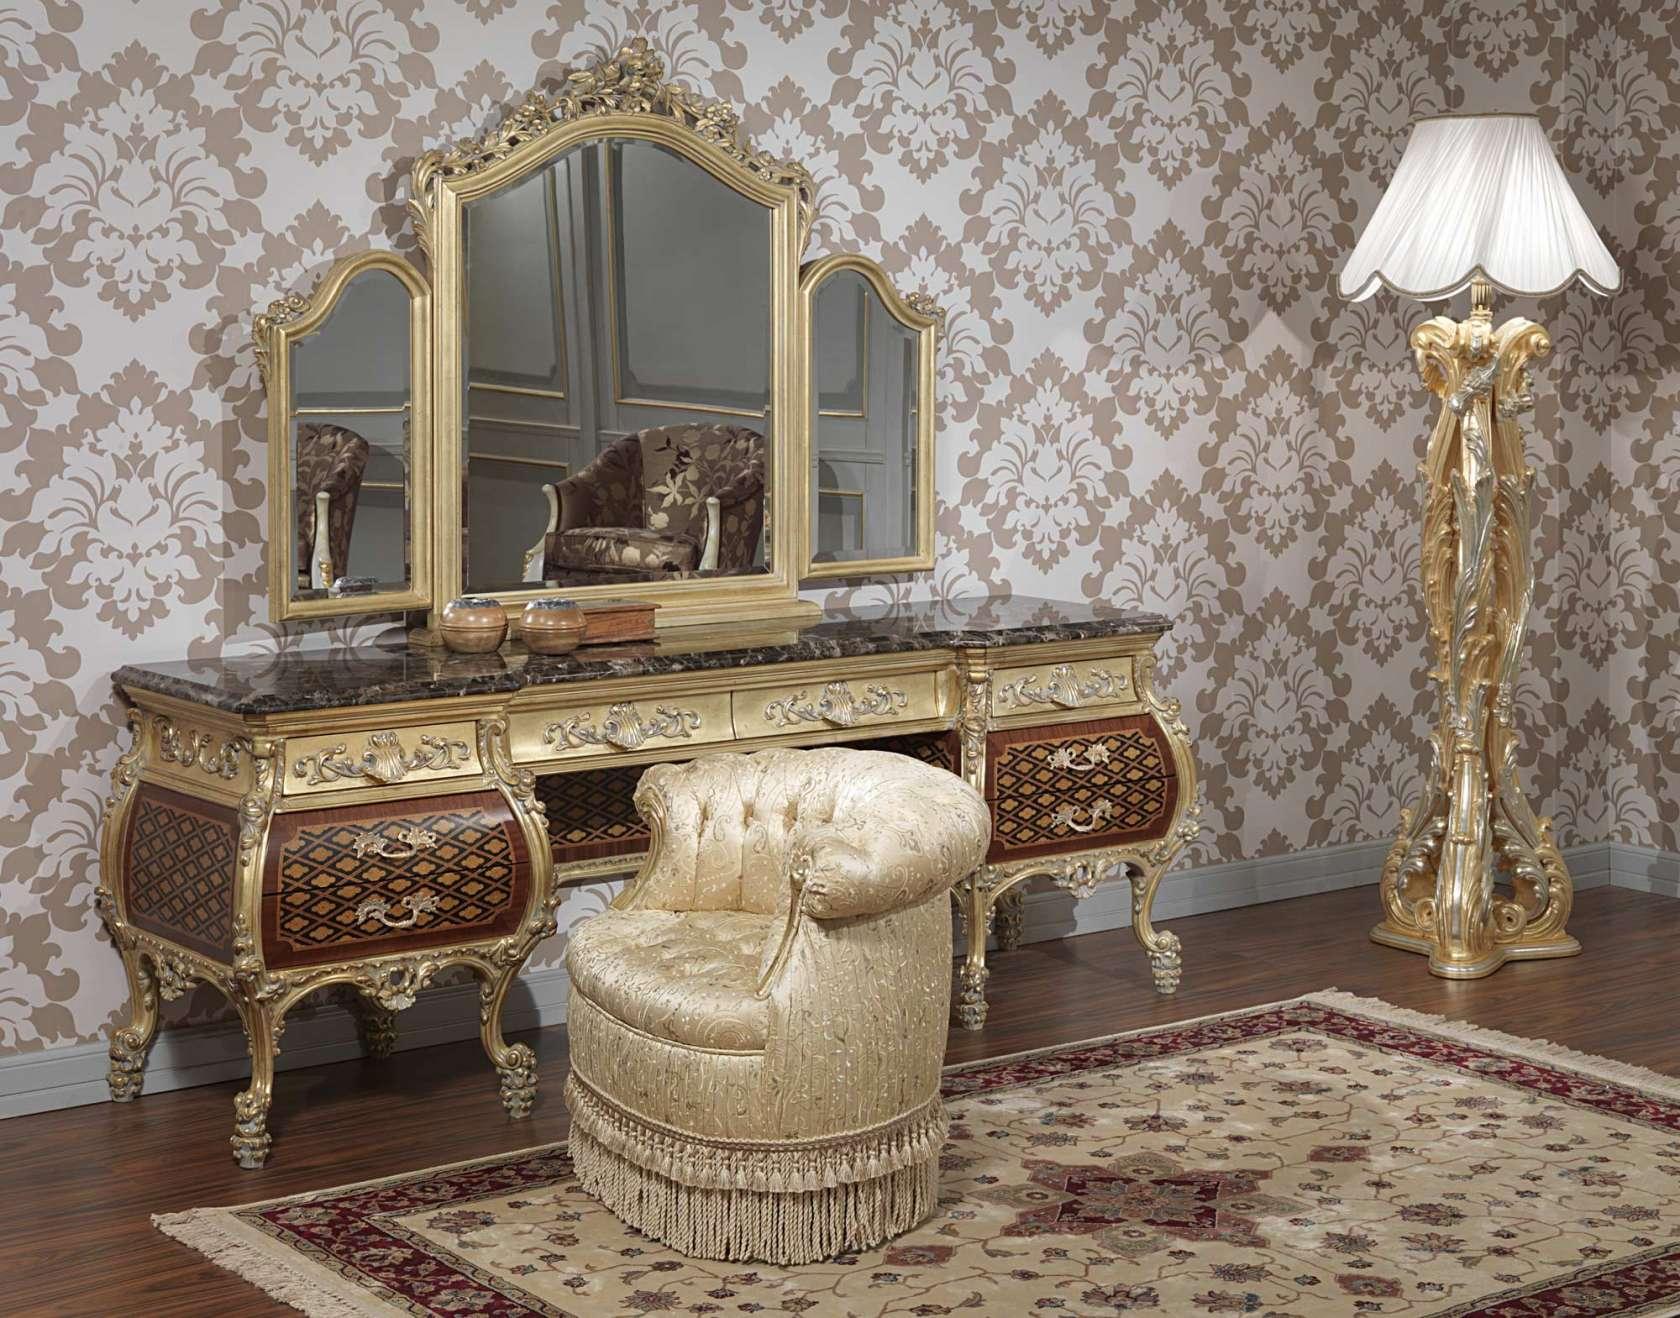 Mobili da camera eleganti emperador gold art 397 931 for Mobili eleganti